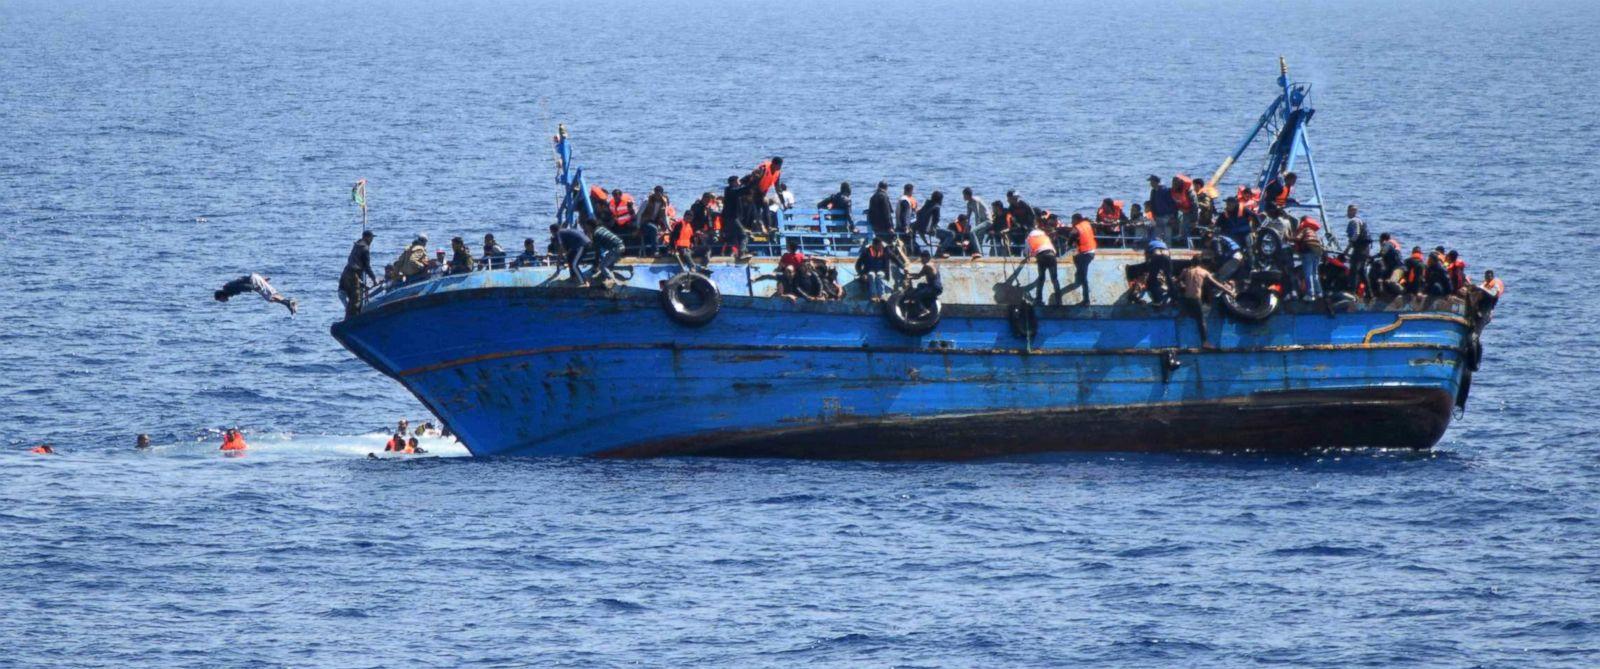 gty_migrant_boat_capsizes_01_jc_160525_12x5_1600